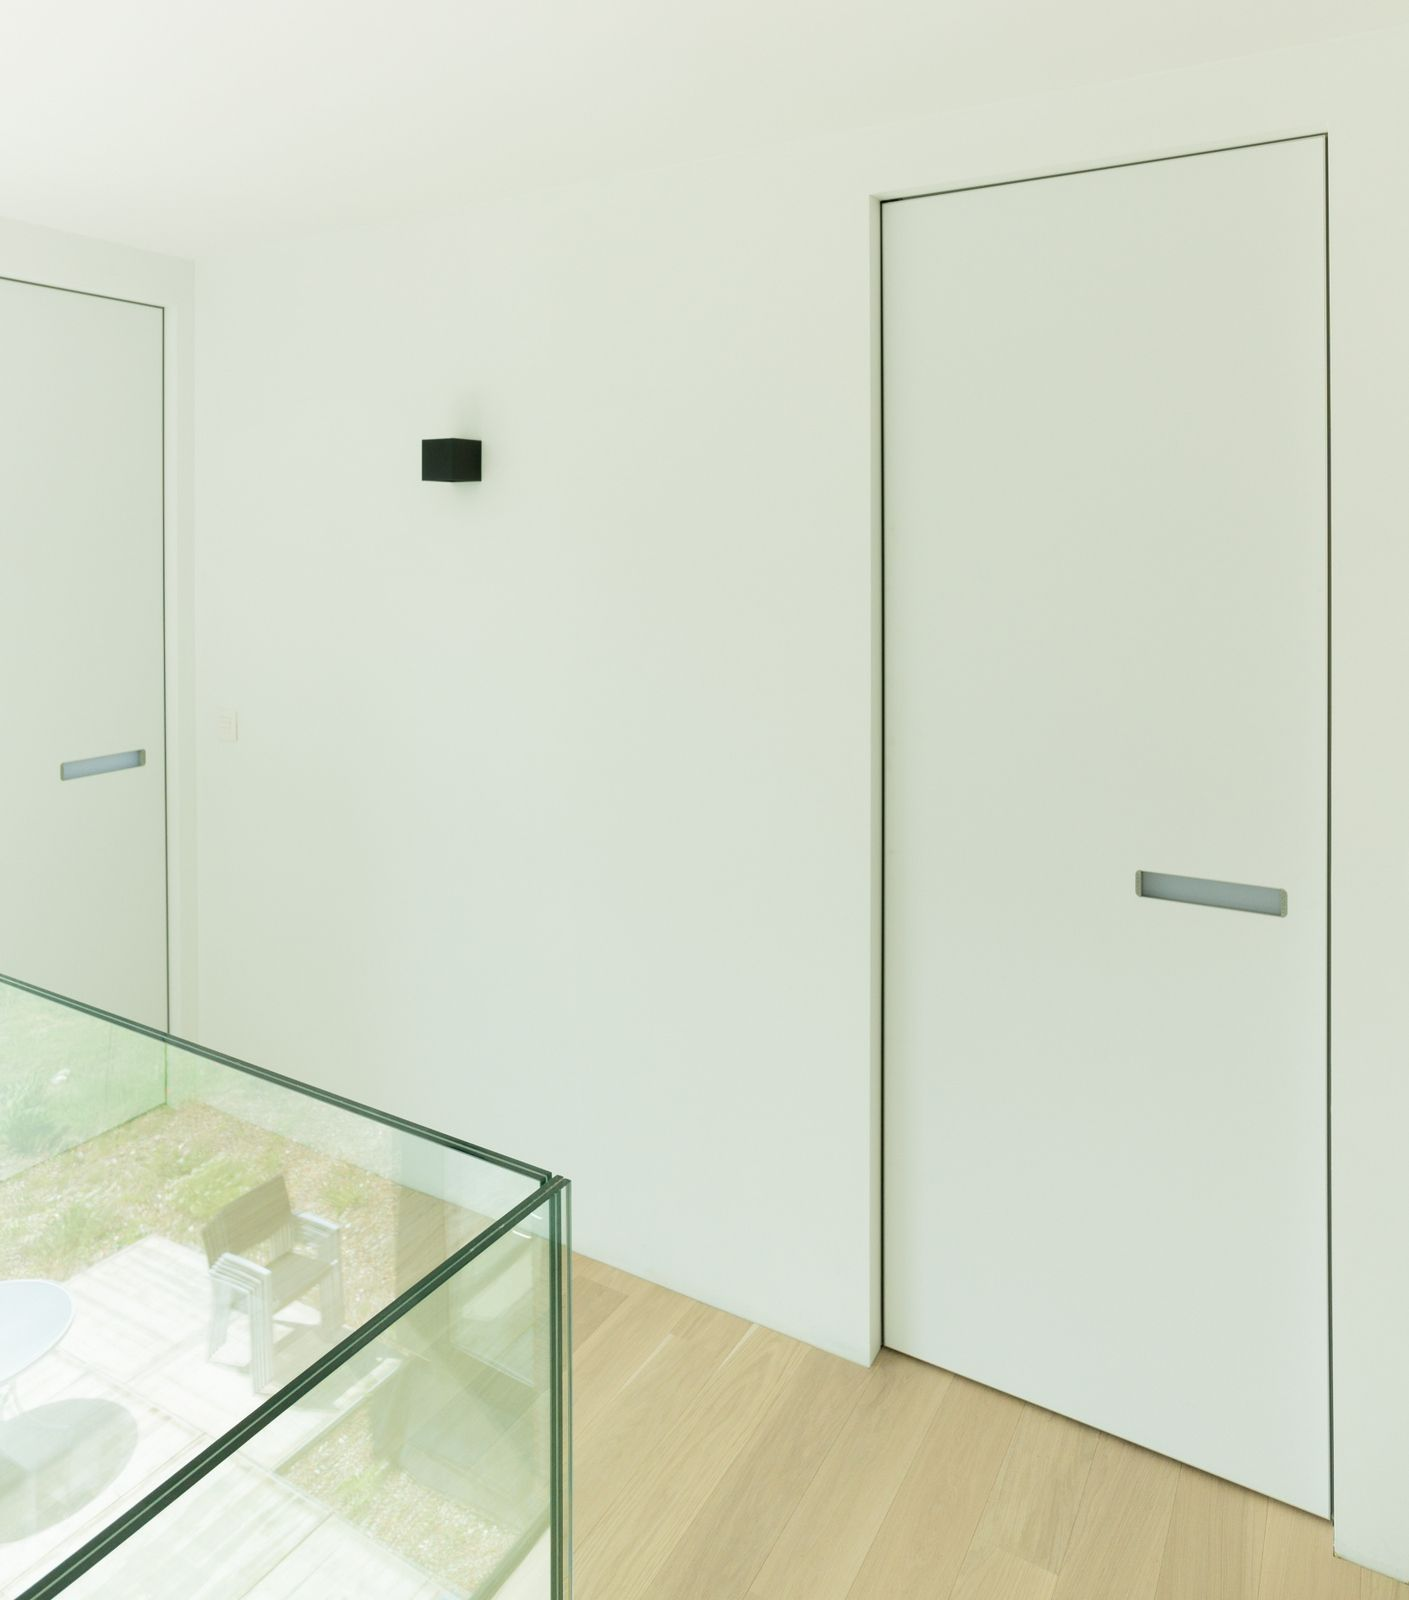 Modern Interior Doors With Invisible Door Frames The Built In